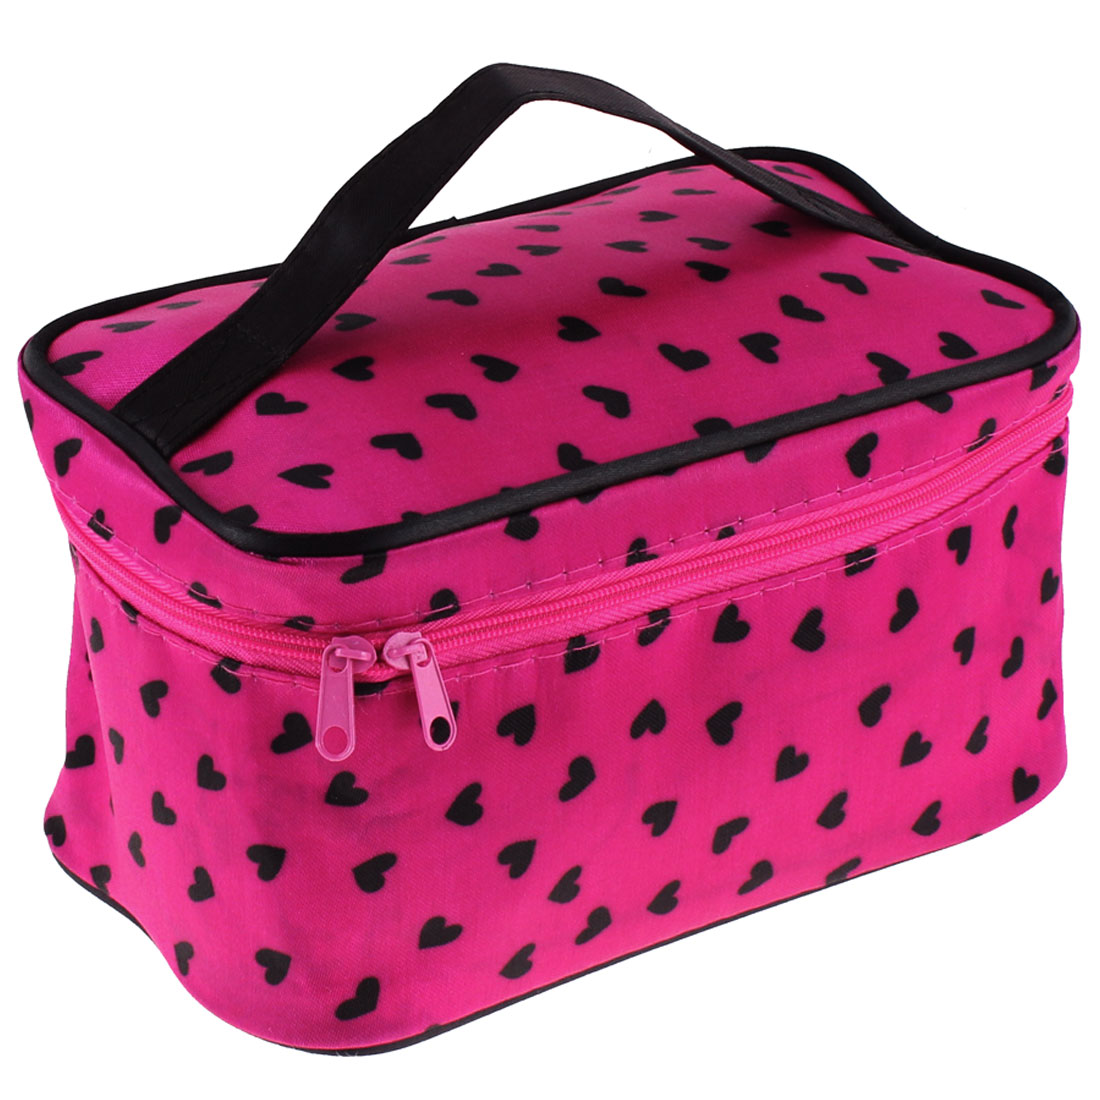 Woman Fuchsia Heart Shape Pattern Zipper Closure Traveling Toiletries Cosmetic Bag Purse Organizer Holder Tool w Mirror